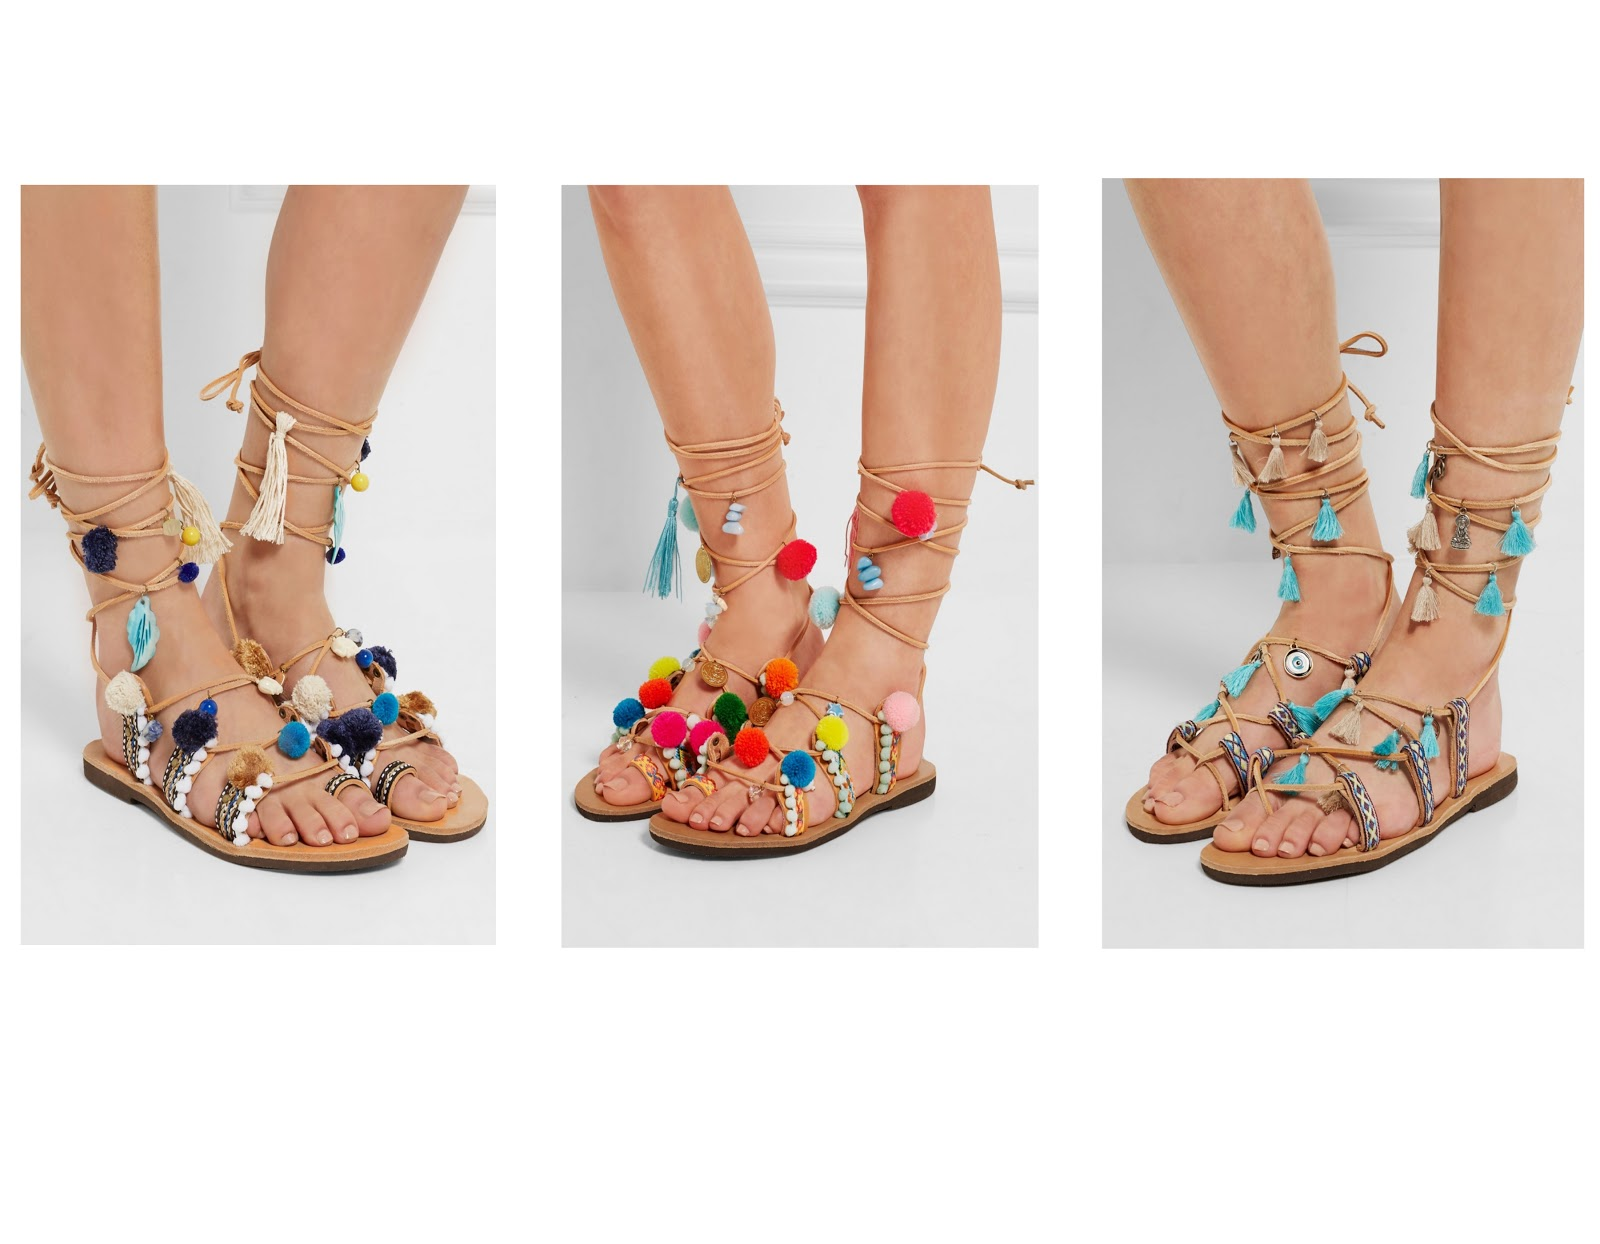 Mabu-Embellished-Leather-Sandals-Tie-Up_Fotor_Collage